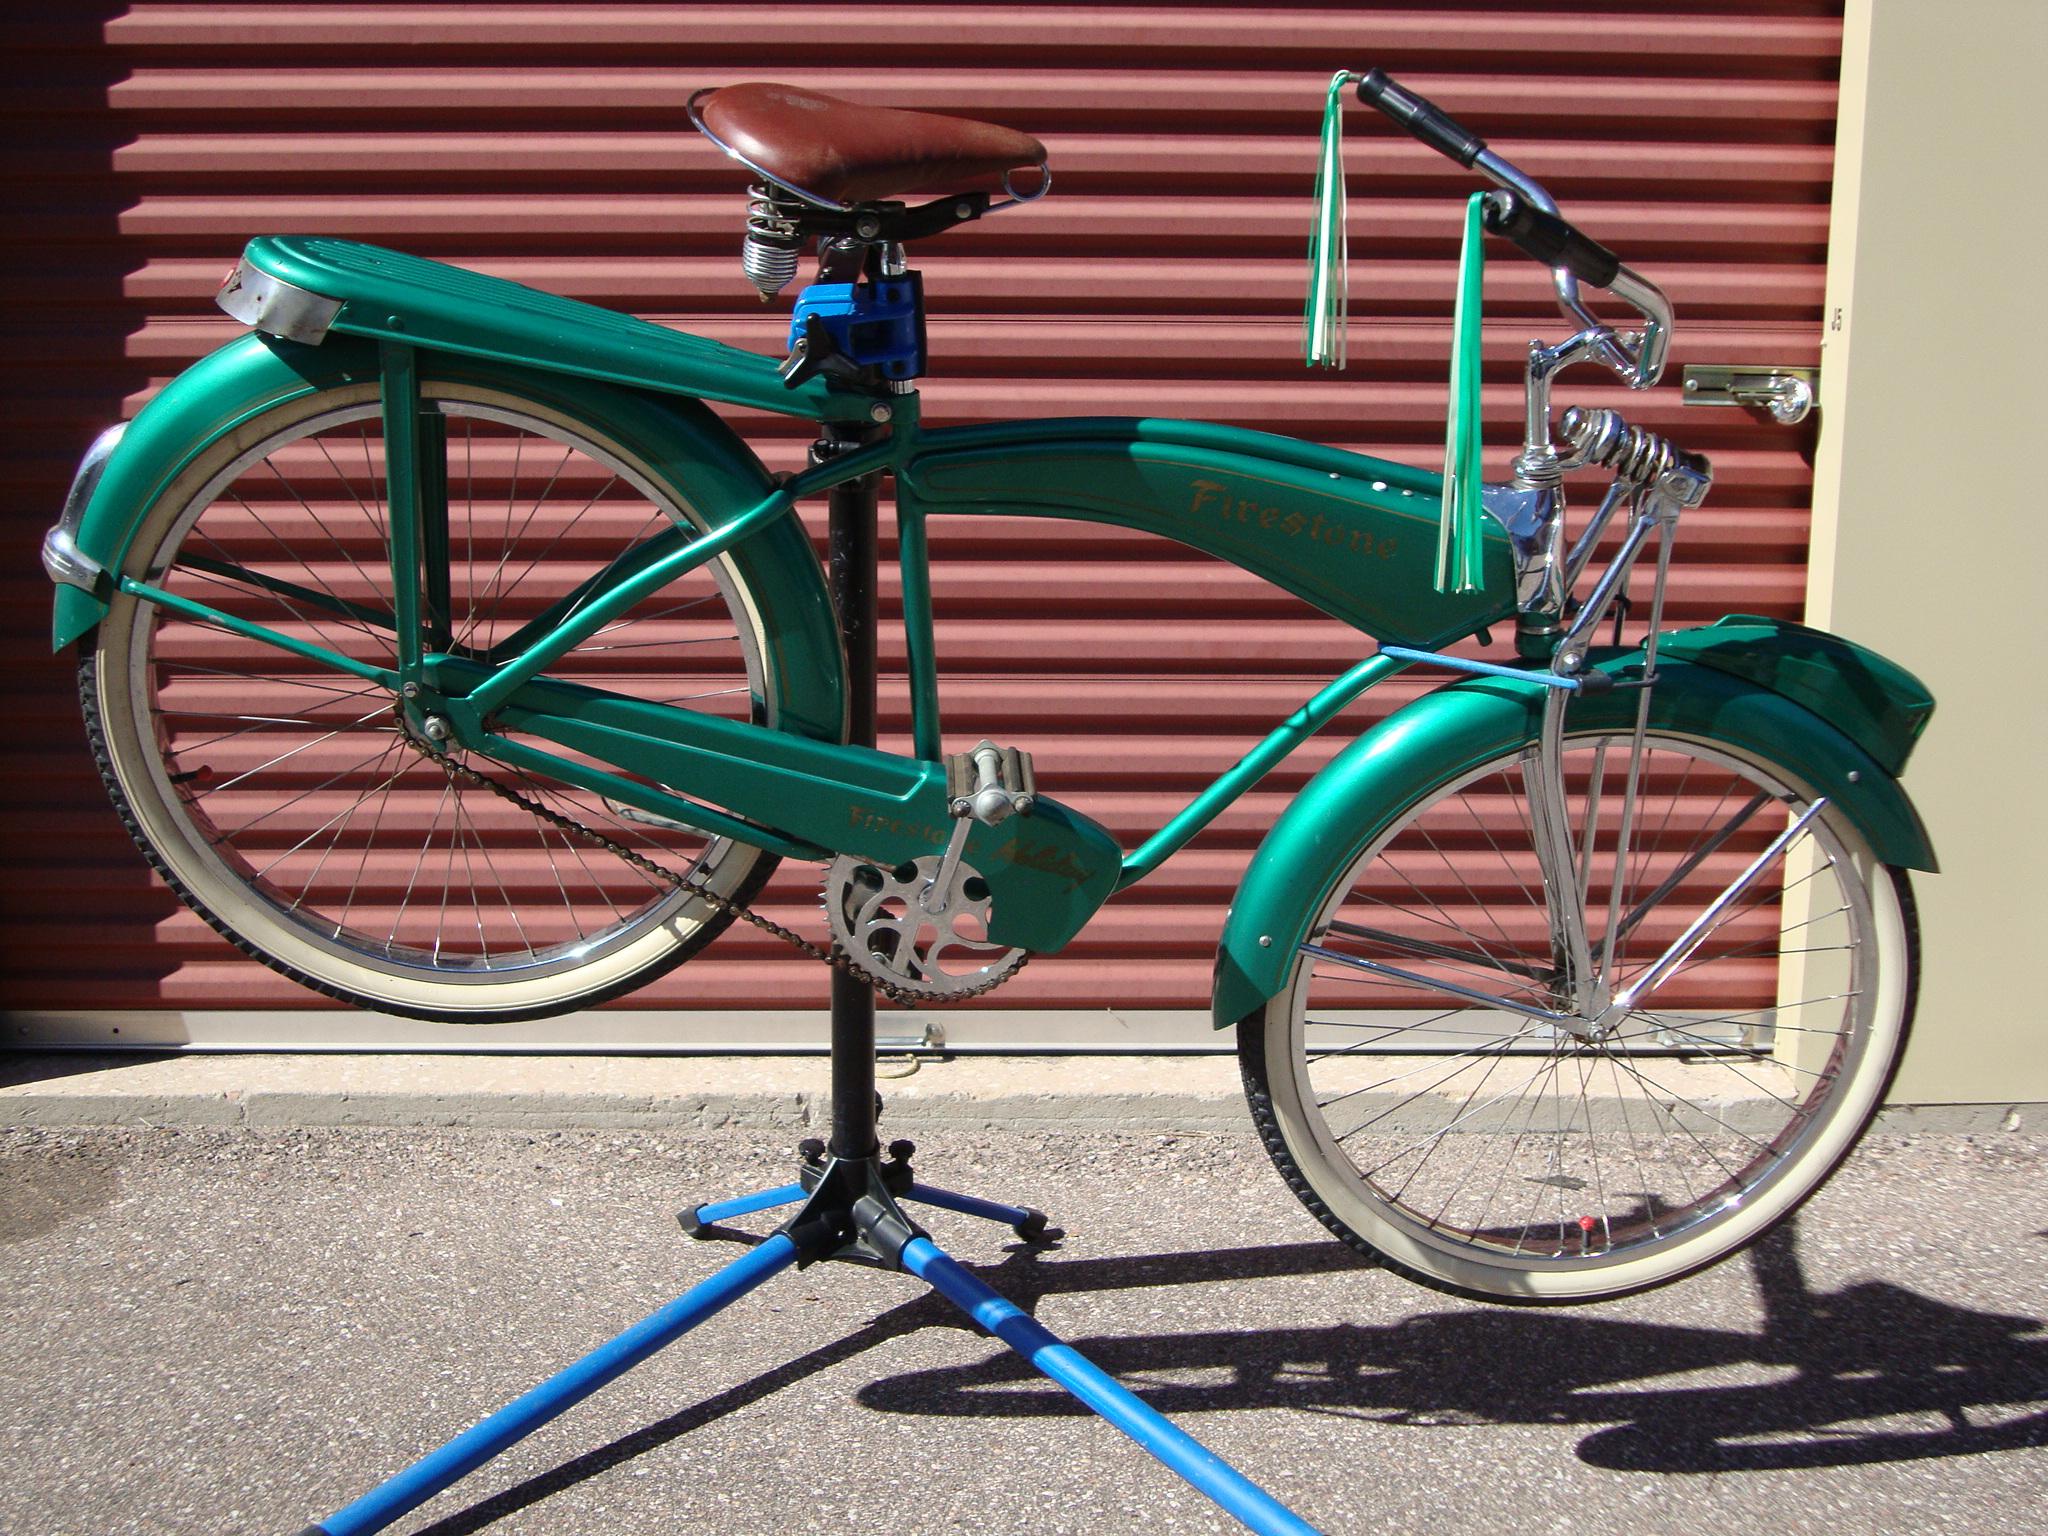 1951Monark built Firestone Holiday - Dave's Vintage Bicycles